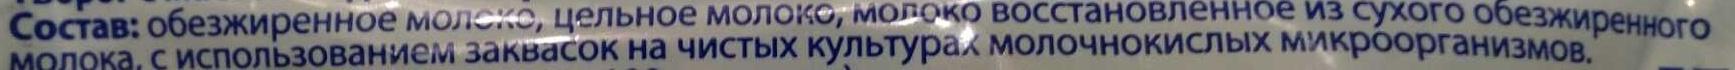 Творог 9% - Ingrédients - ru